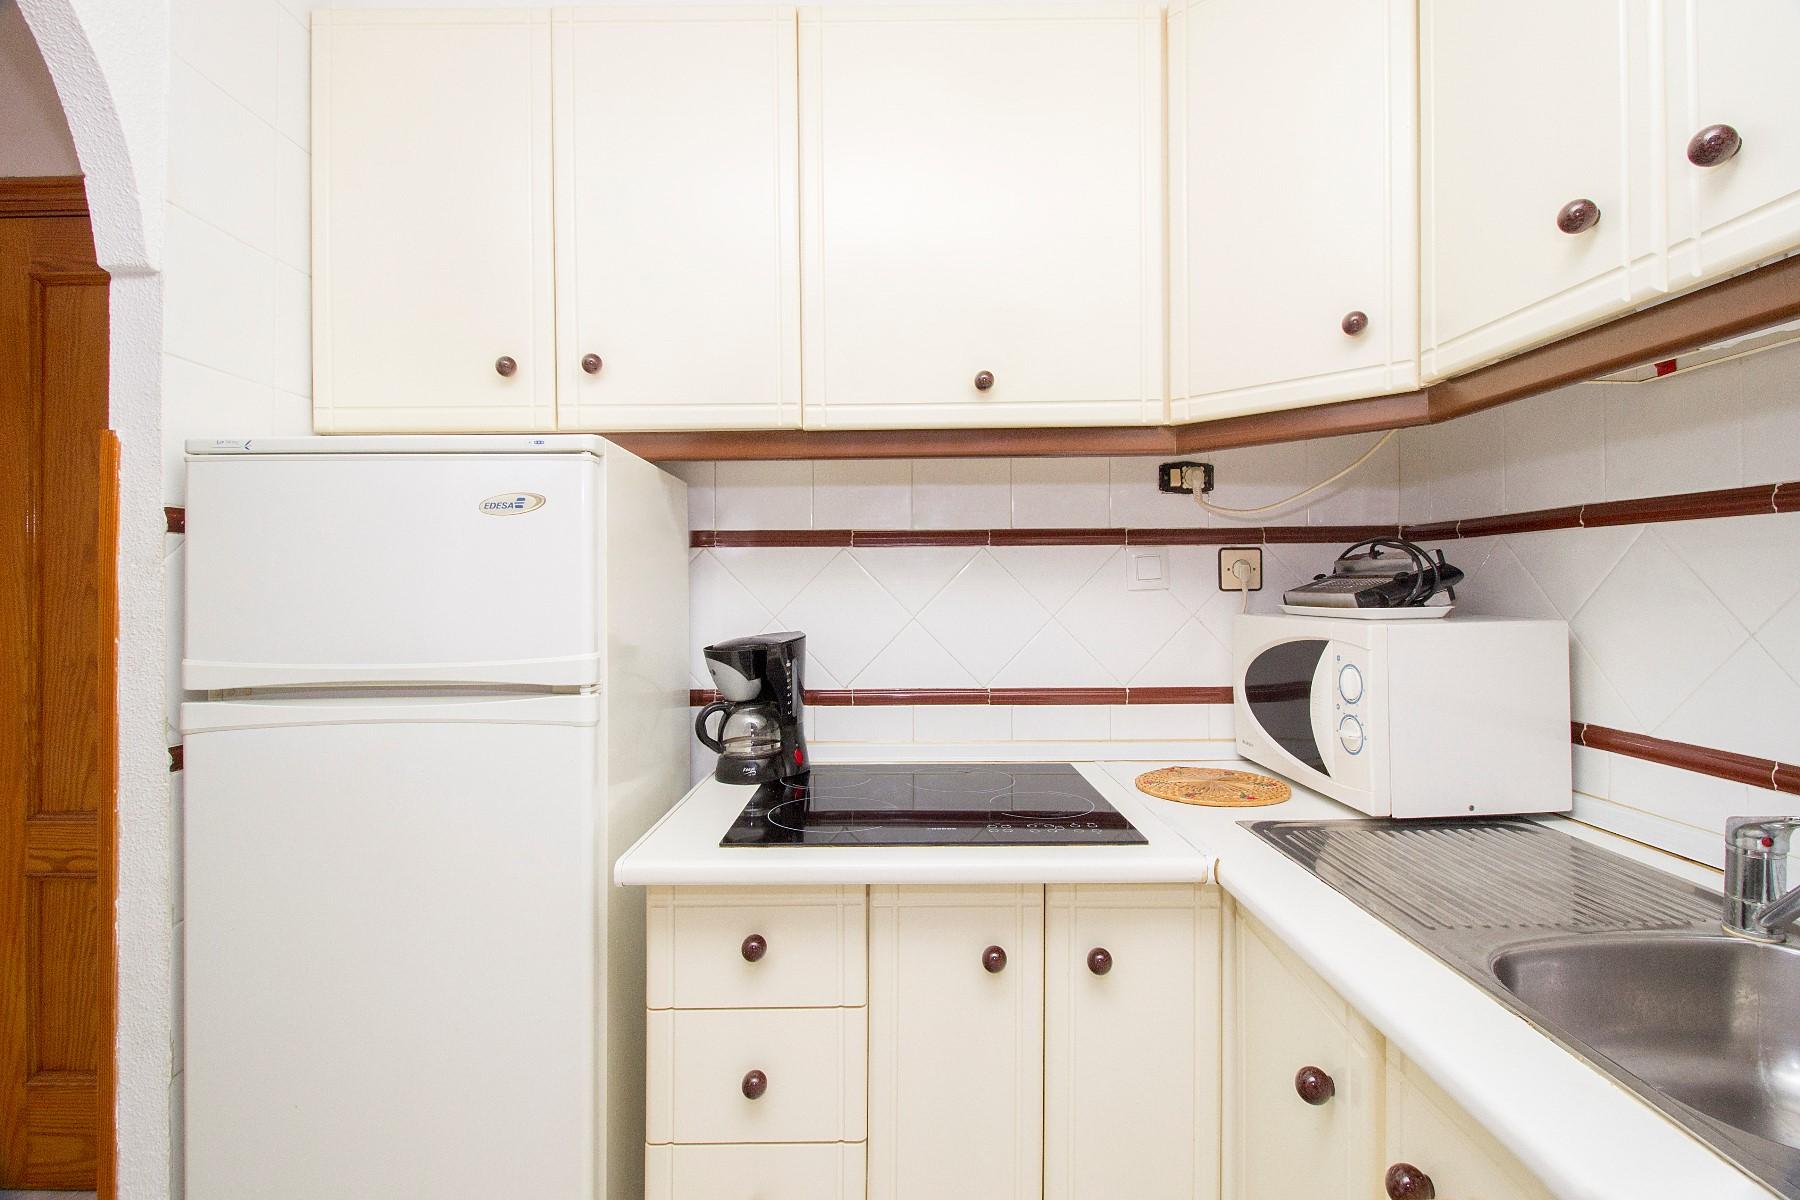 Однокомнатная квартира 40 кв м кухня